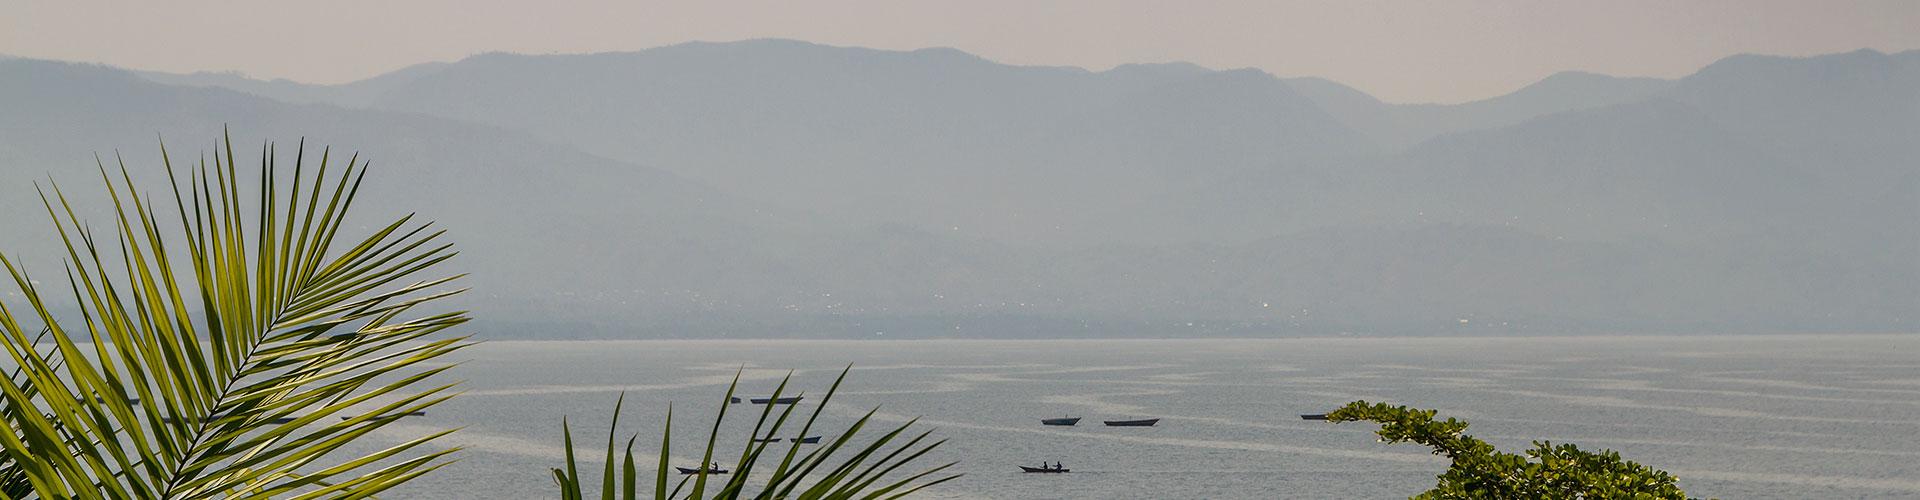 Landmark photograph of Burundi